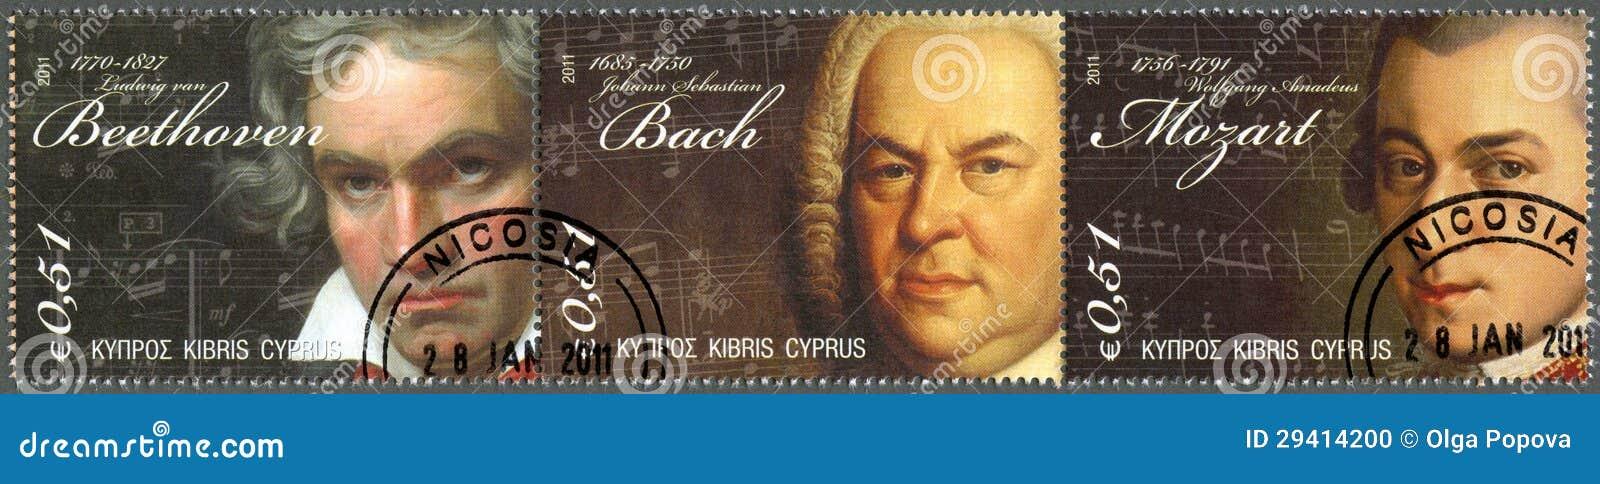 CYPR - 2011: Ludwig Van Beethoven, Johann Sebastian Bach, Wolfgang Amadeus Mozart